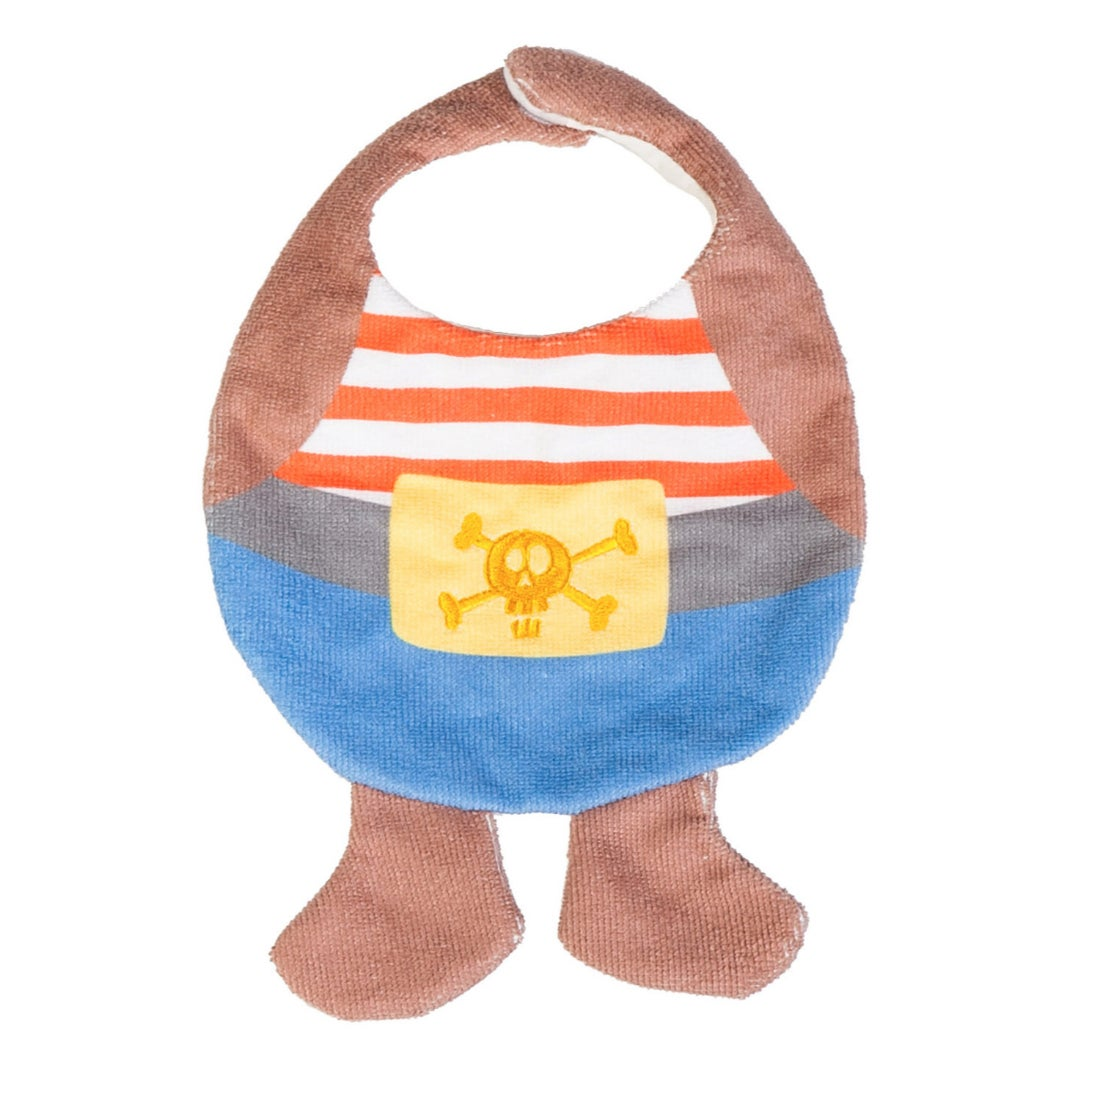 Pirate Novelty Baby Bib